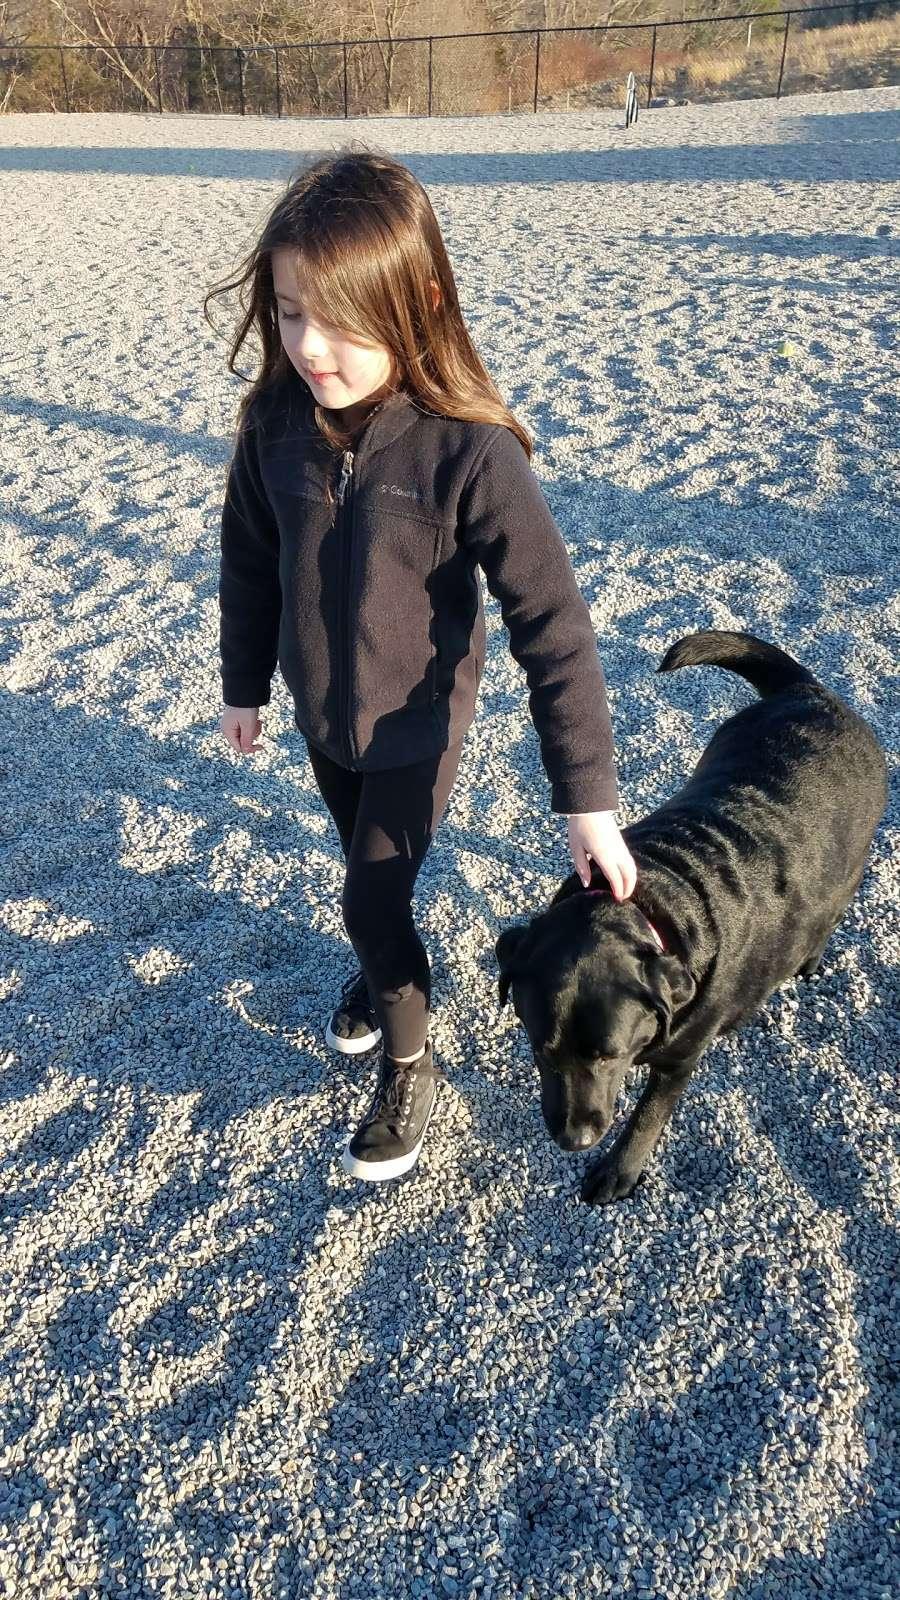 Boneyard Dog Park - park  | Photo 4 of 10 | Address: Kingston, MA 02364, USA